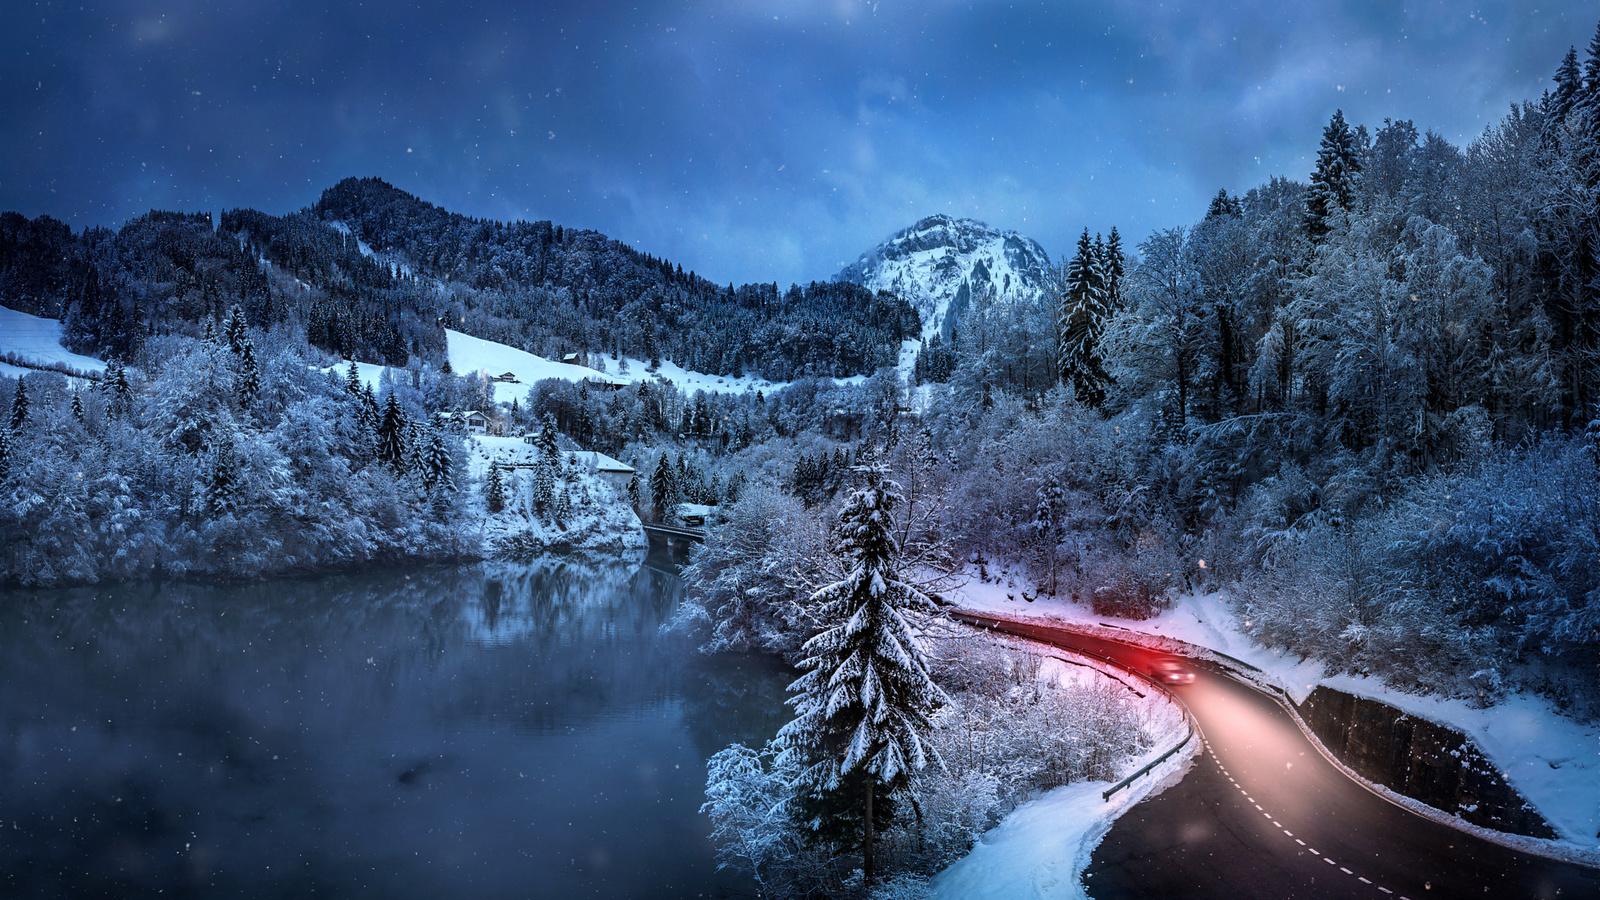 markus stauffer, швейцария, природа, пейзаж, горы, леса, озеро, дорога, посёлок, зима, снег